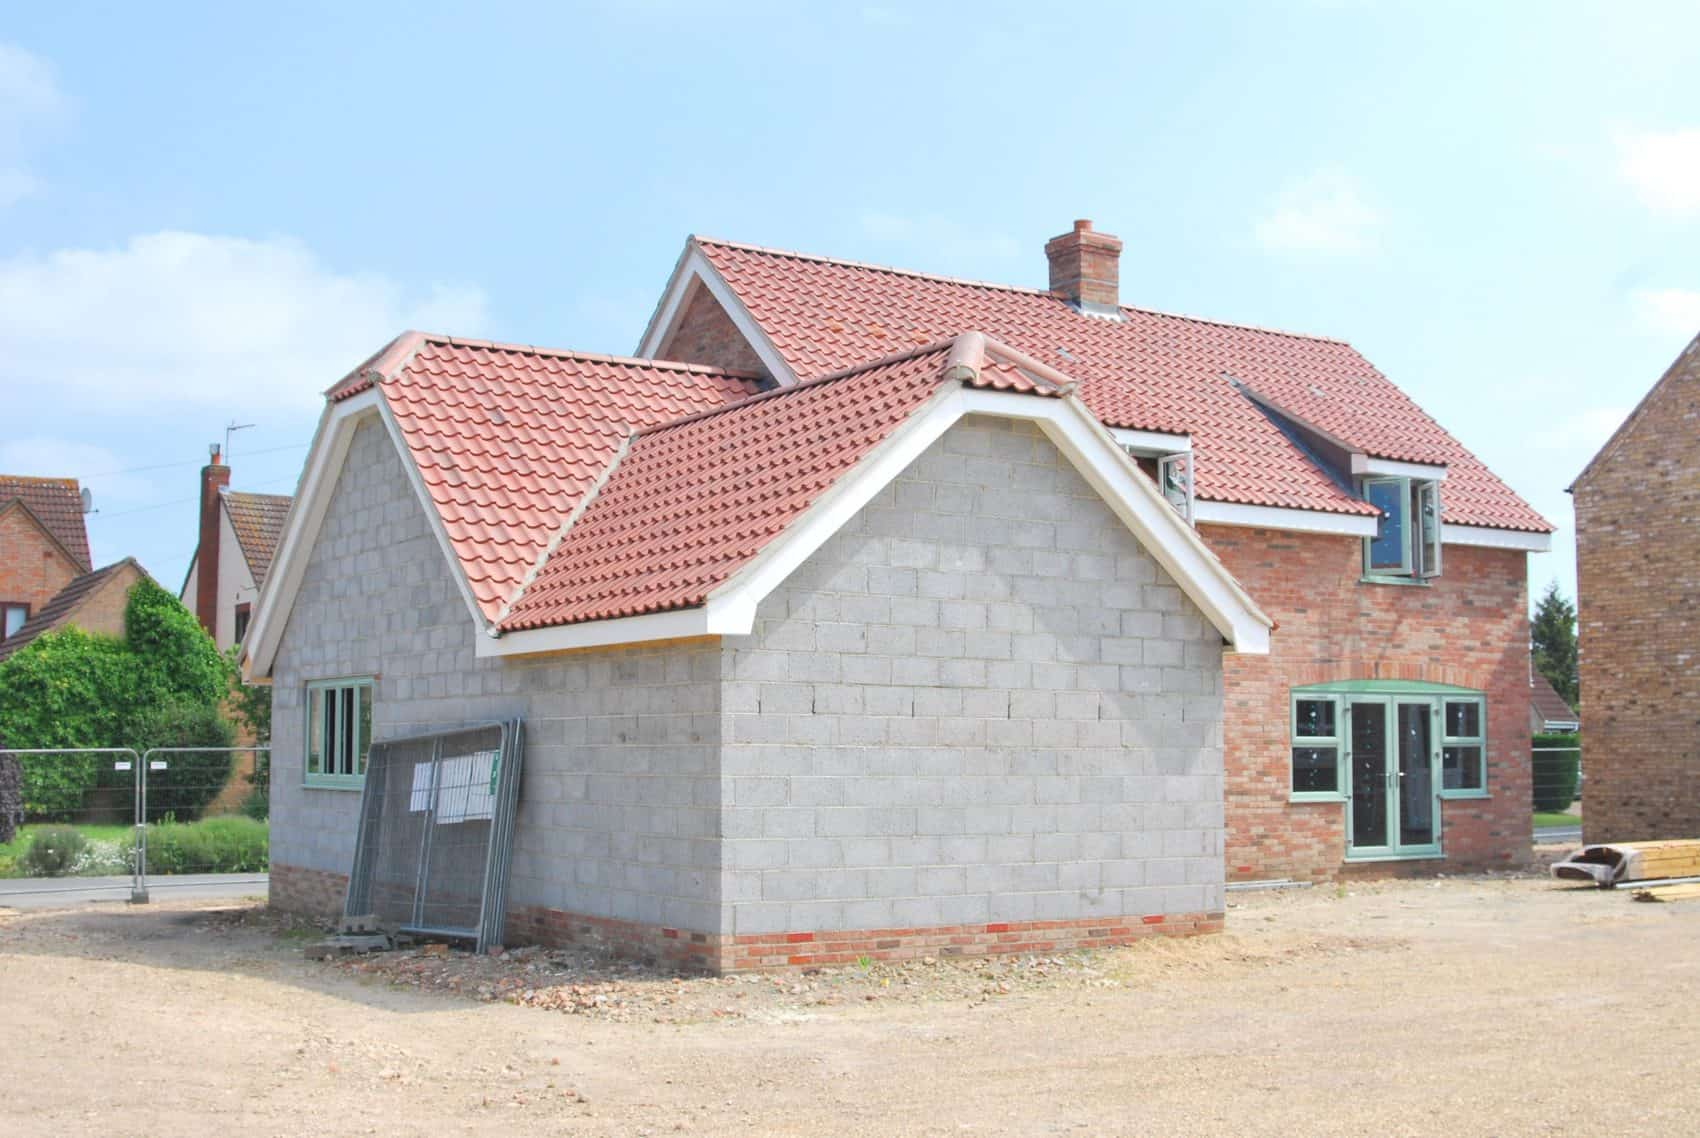 upward-barn conversions-traditional build-plot5-13-min